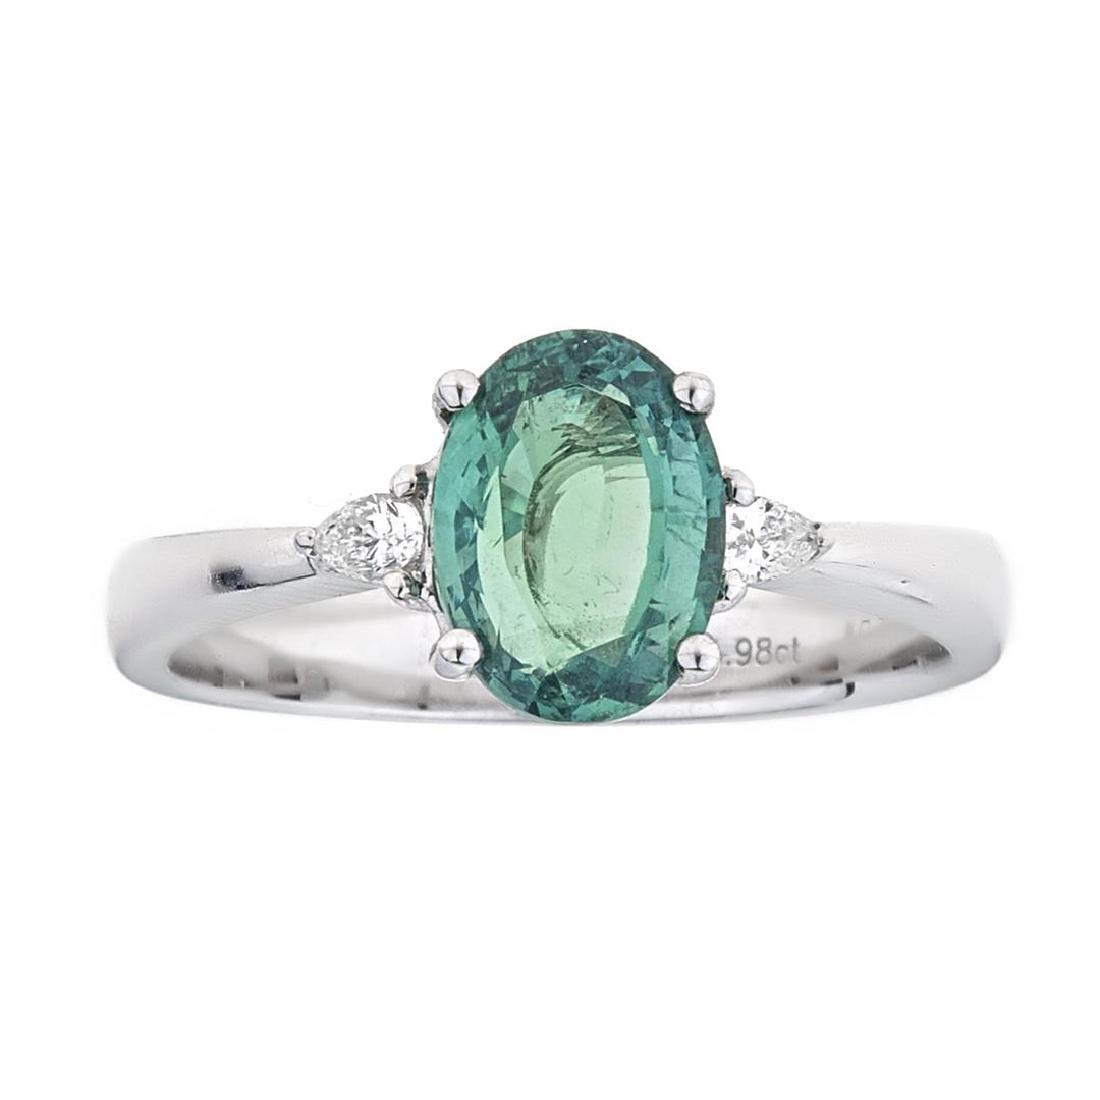 1.98 ctw Alexandrite and Diamond Ring - 18KT White Gold